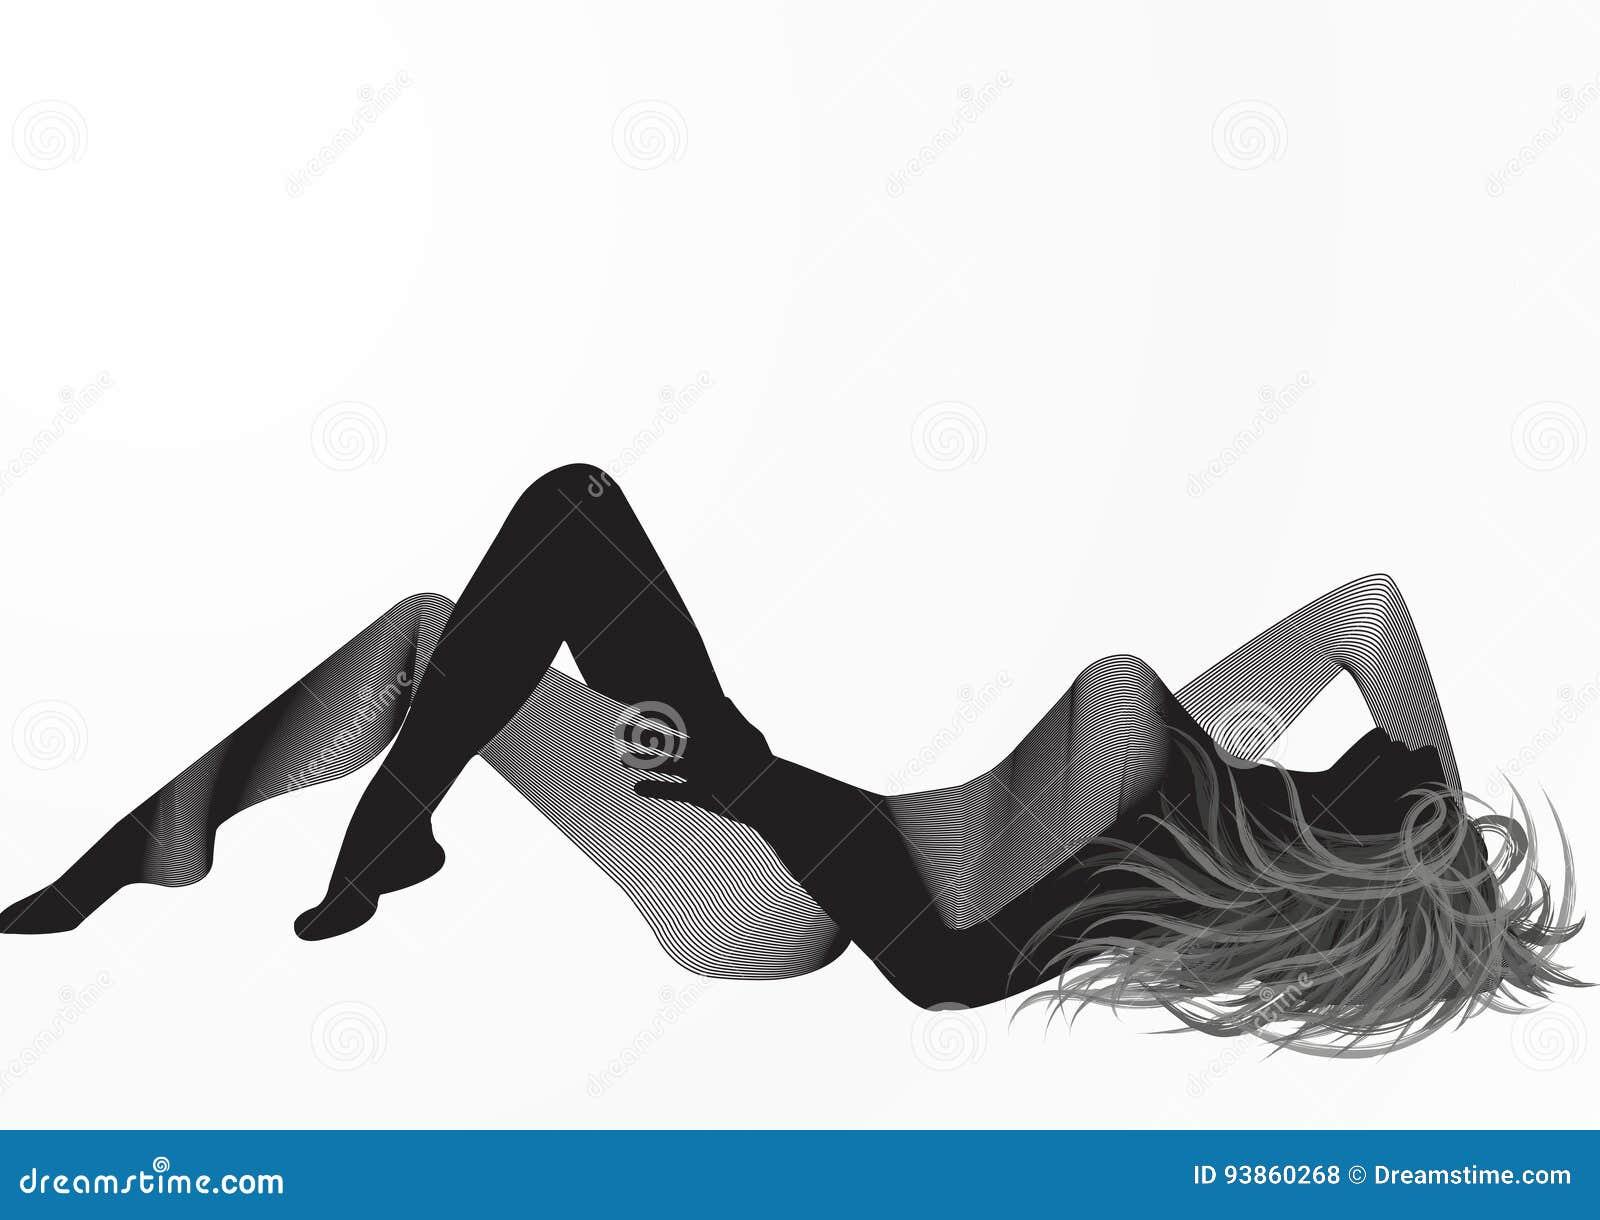 001 silhouette woman